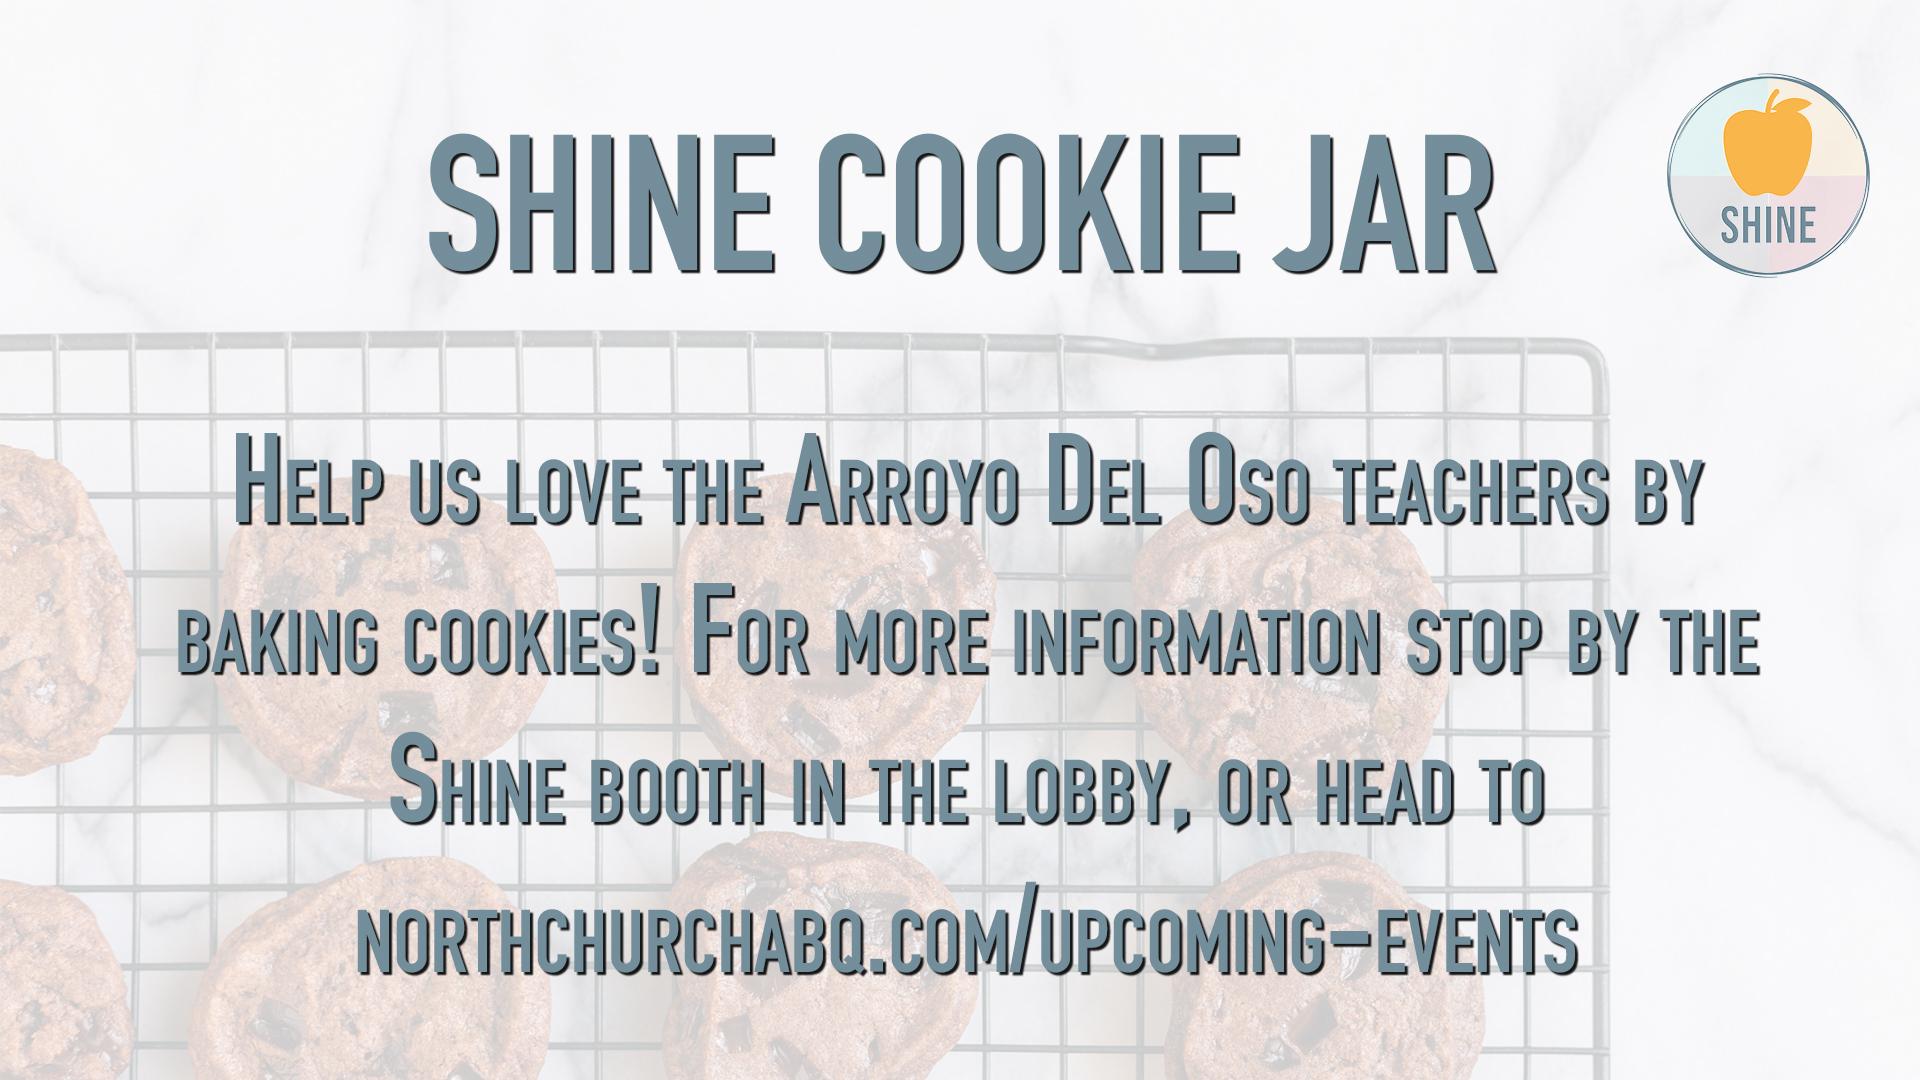 Shine cookei jar.jpg